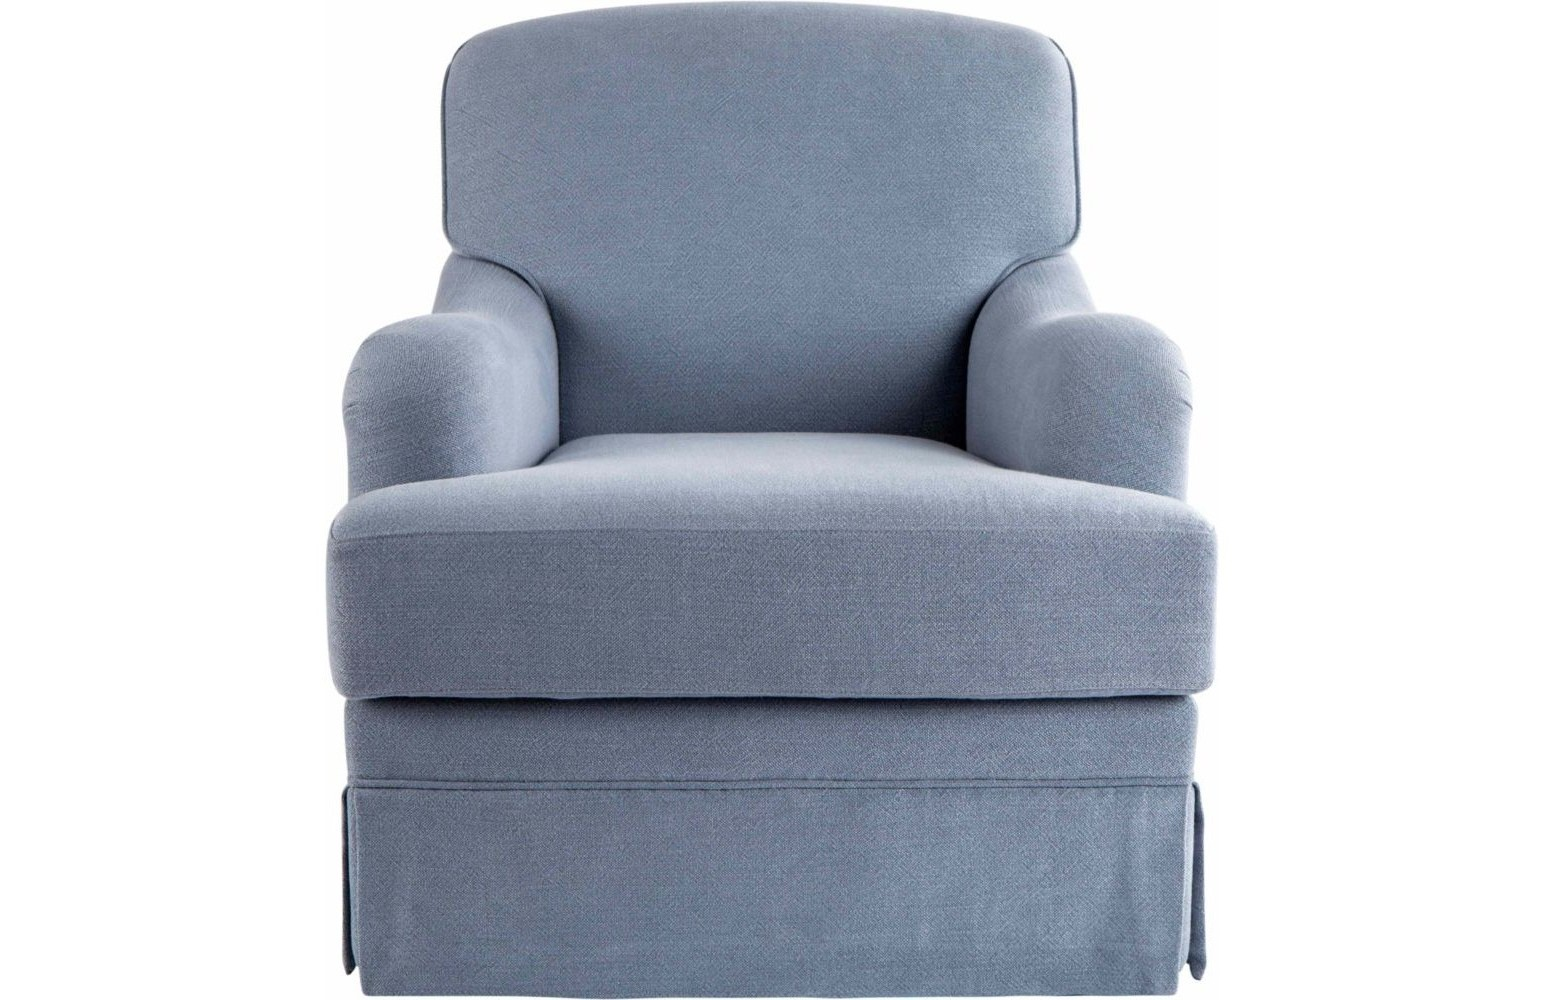 КреслоИнтерьерные кресла<br><br><br>Material: Текстиль<br>Width см: 88<br>Depth см: 103<br>Height см: 92